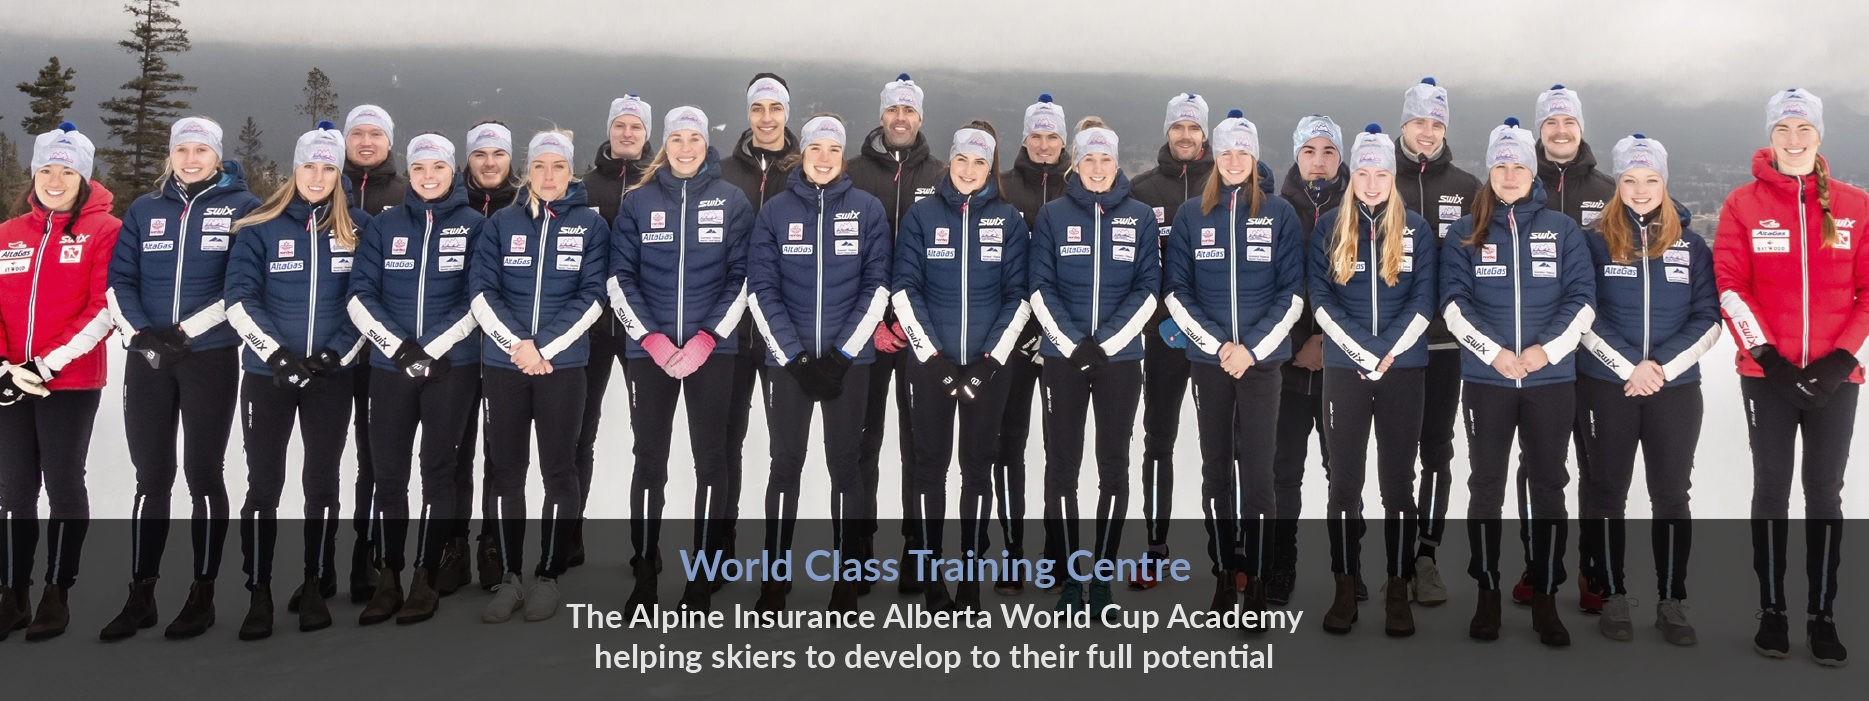 Alberta World Cup Academy Team 2020